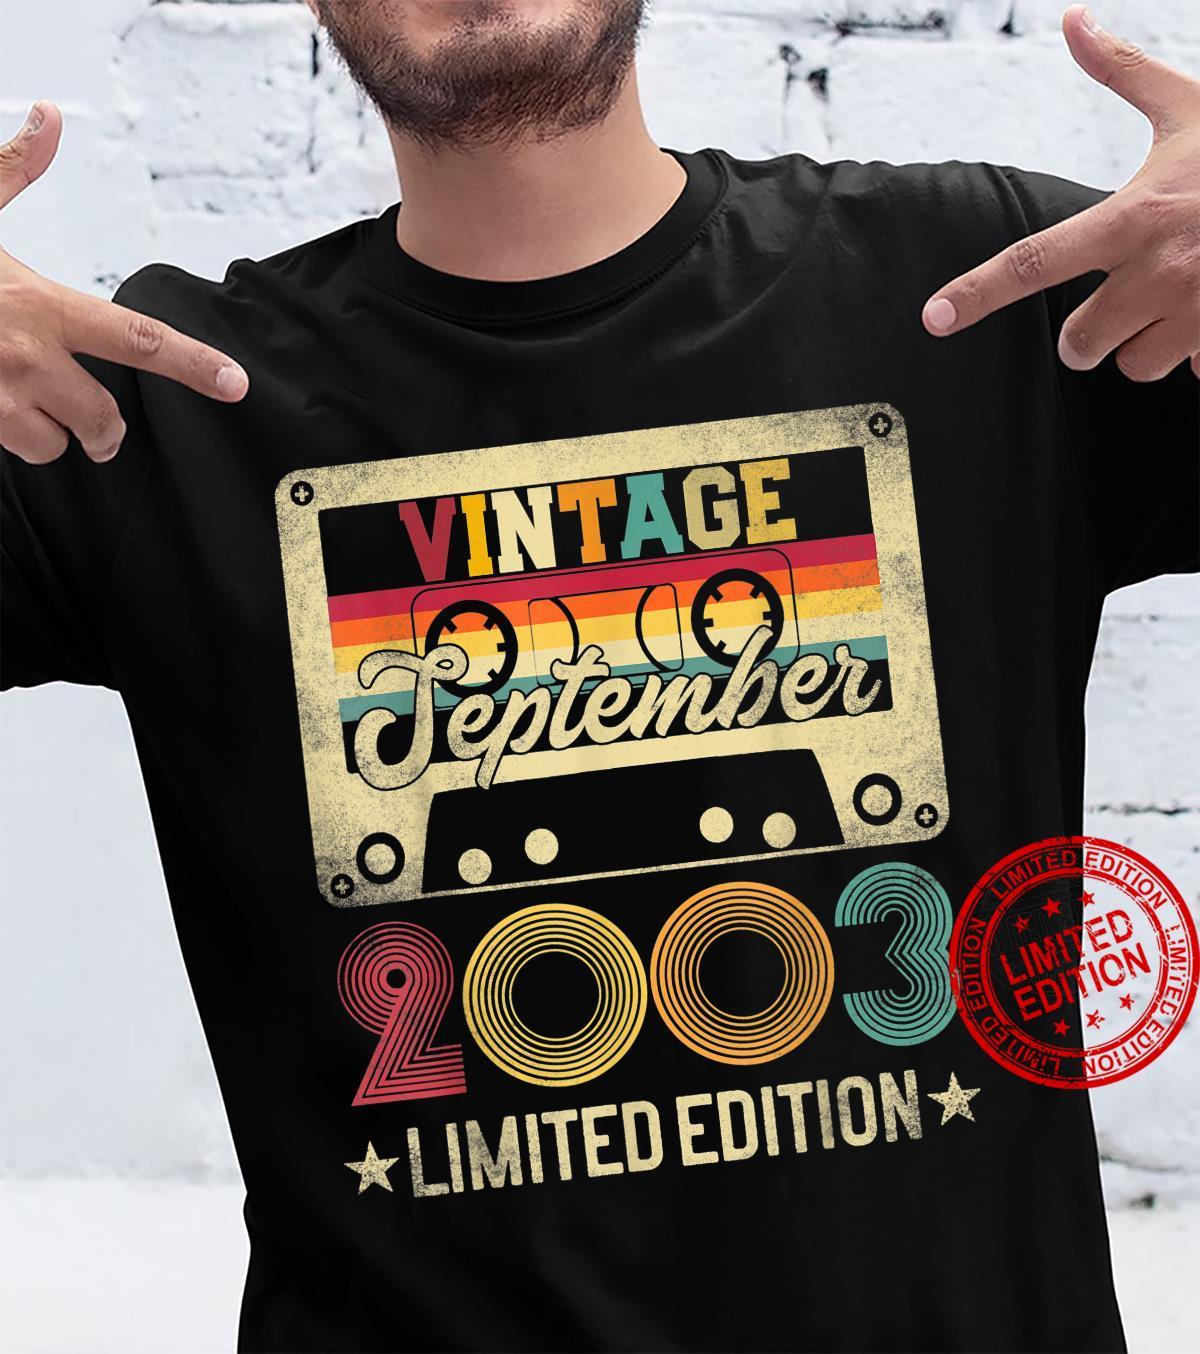 2003 18th September Birthday Limited Edition Vintage Shirt